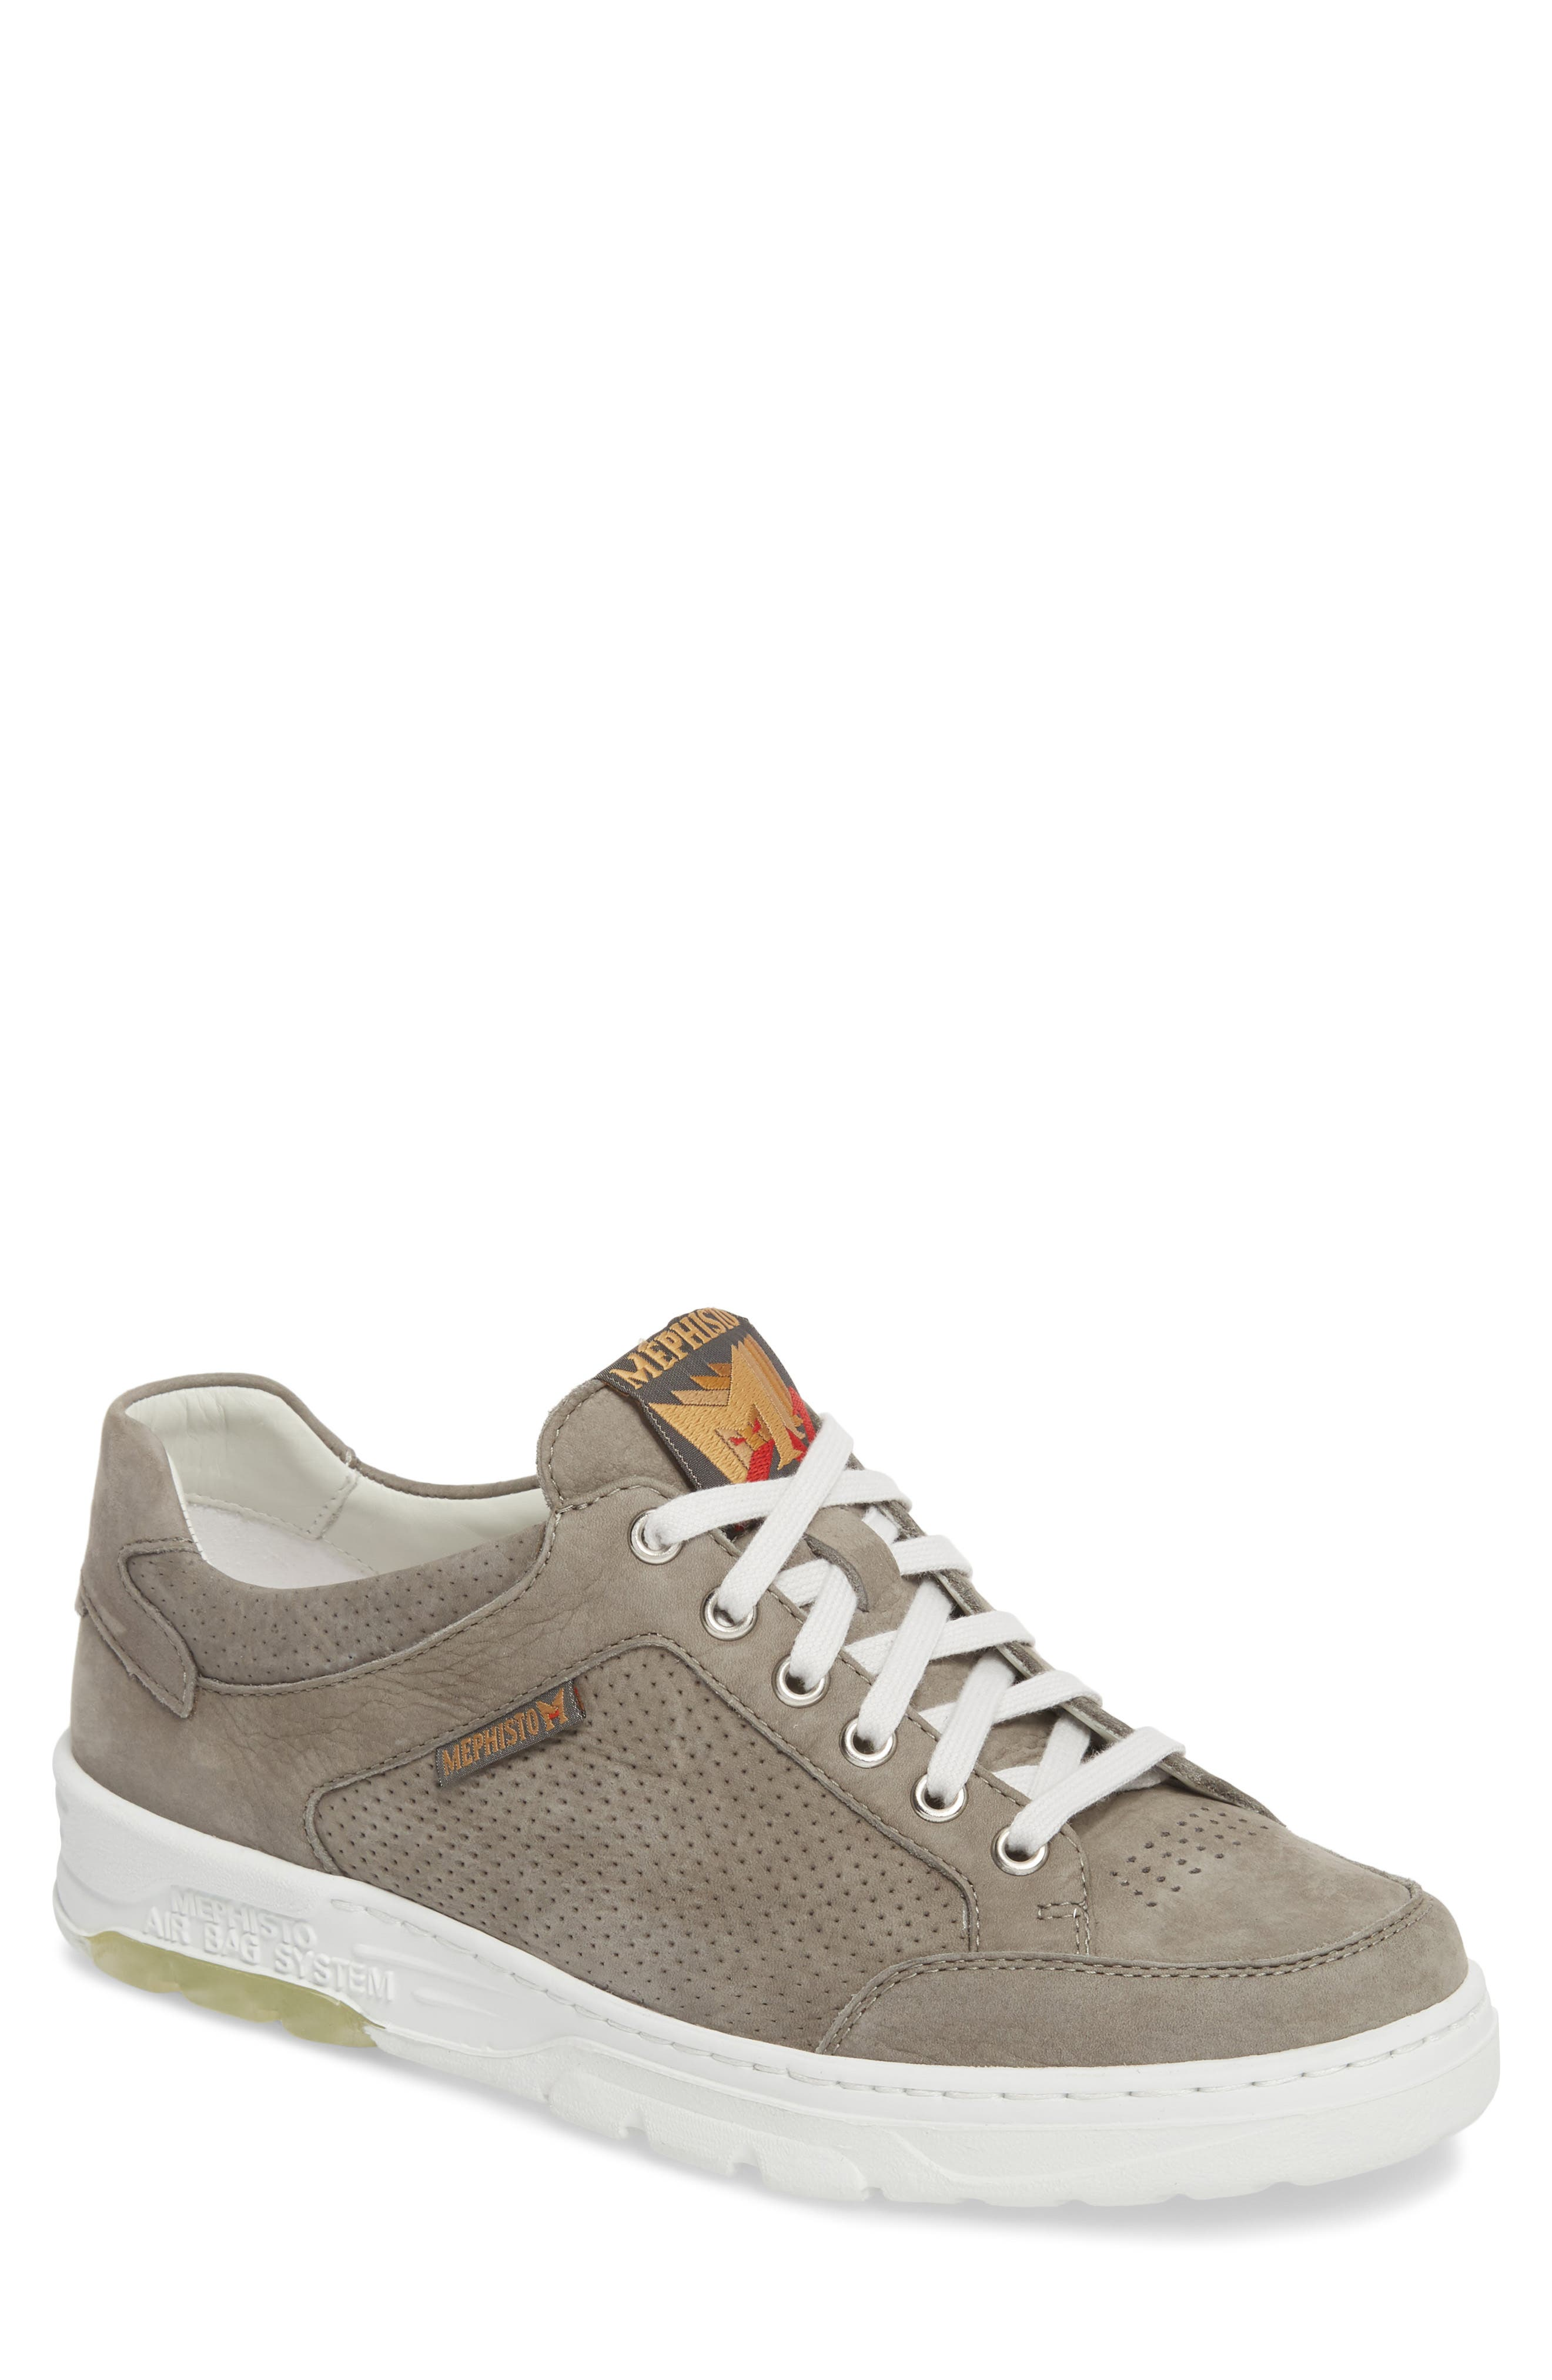 Mathias Perforated Sneaker,                         Main,                         color, Light Grey